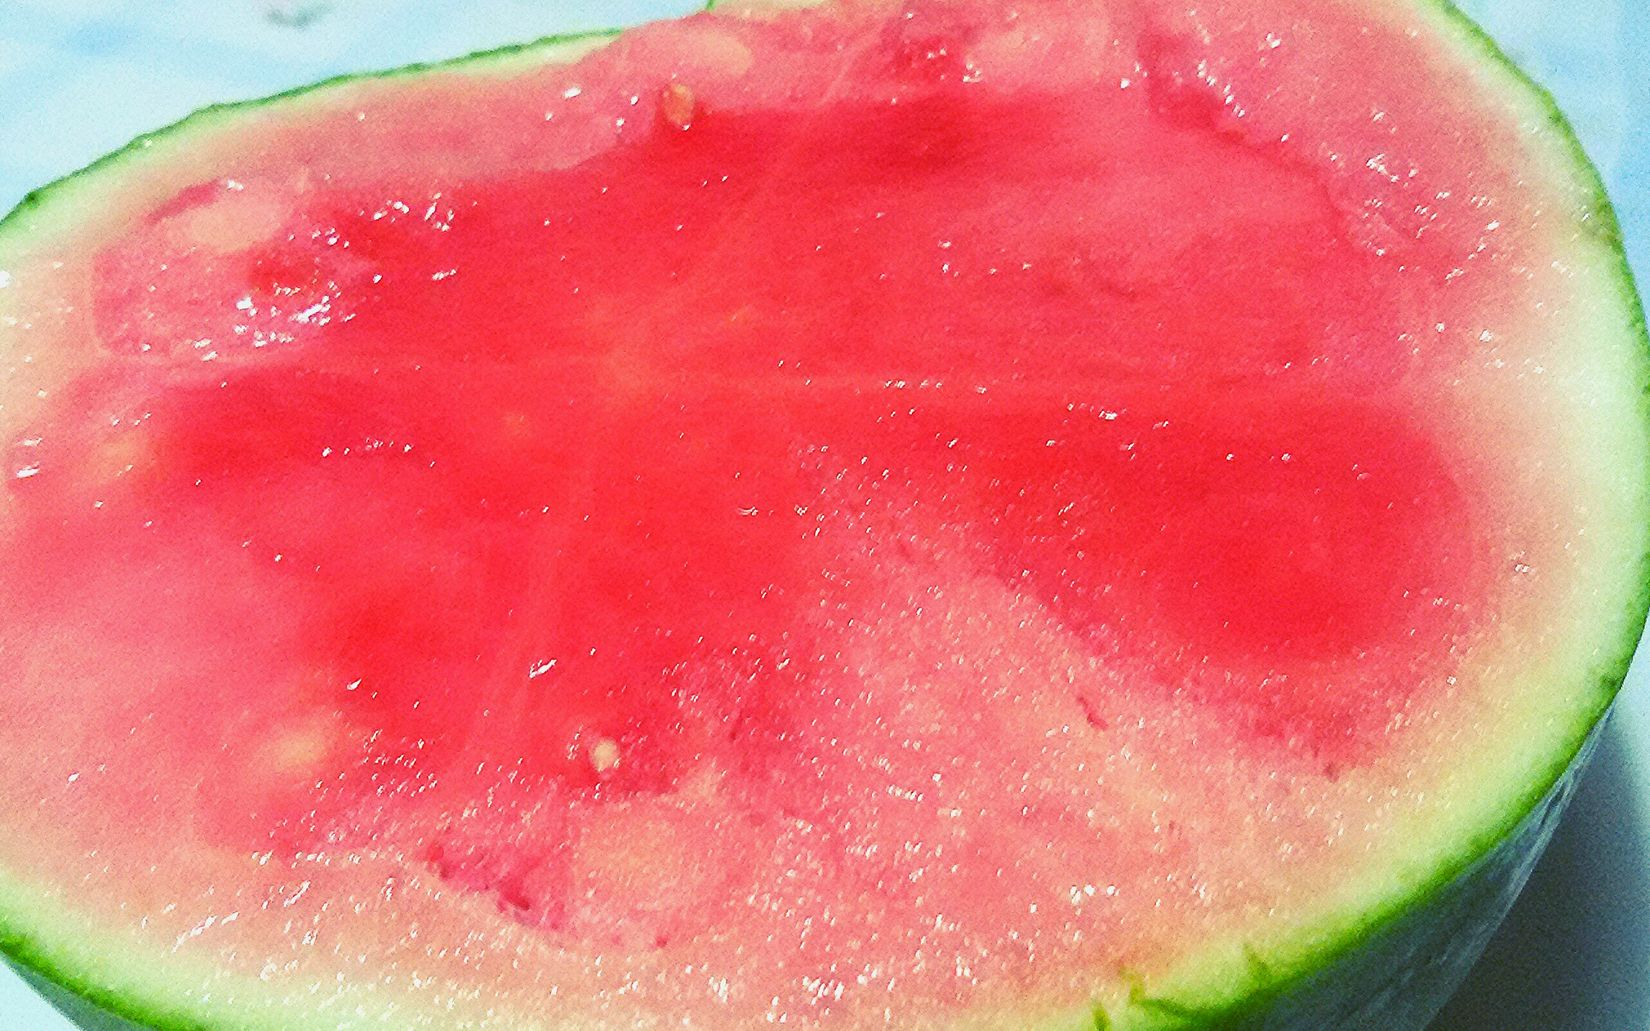 Baby Watermelon Breakfast Rawfood Vegan Food Summer